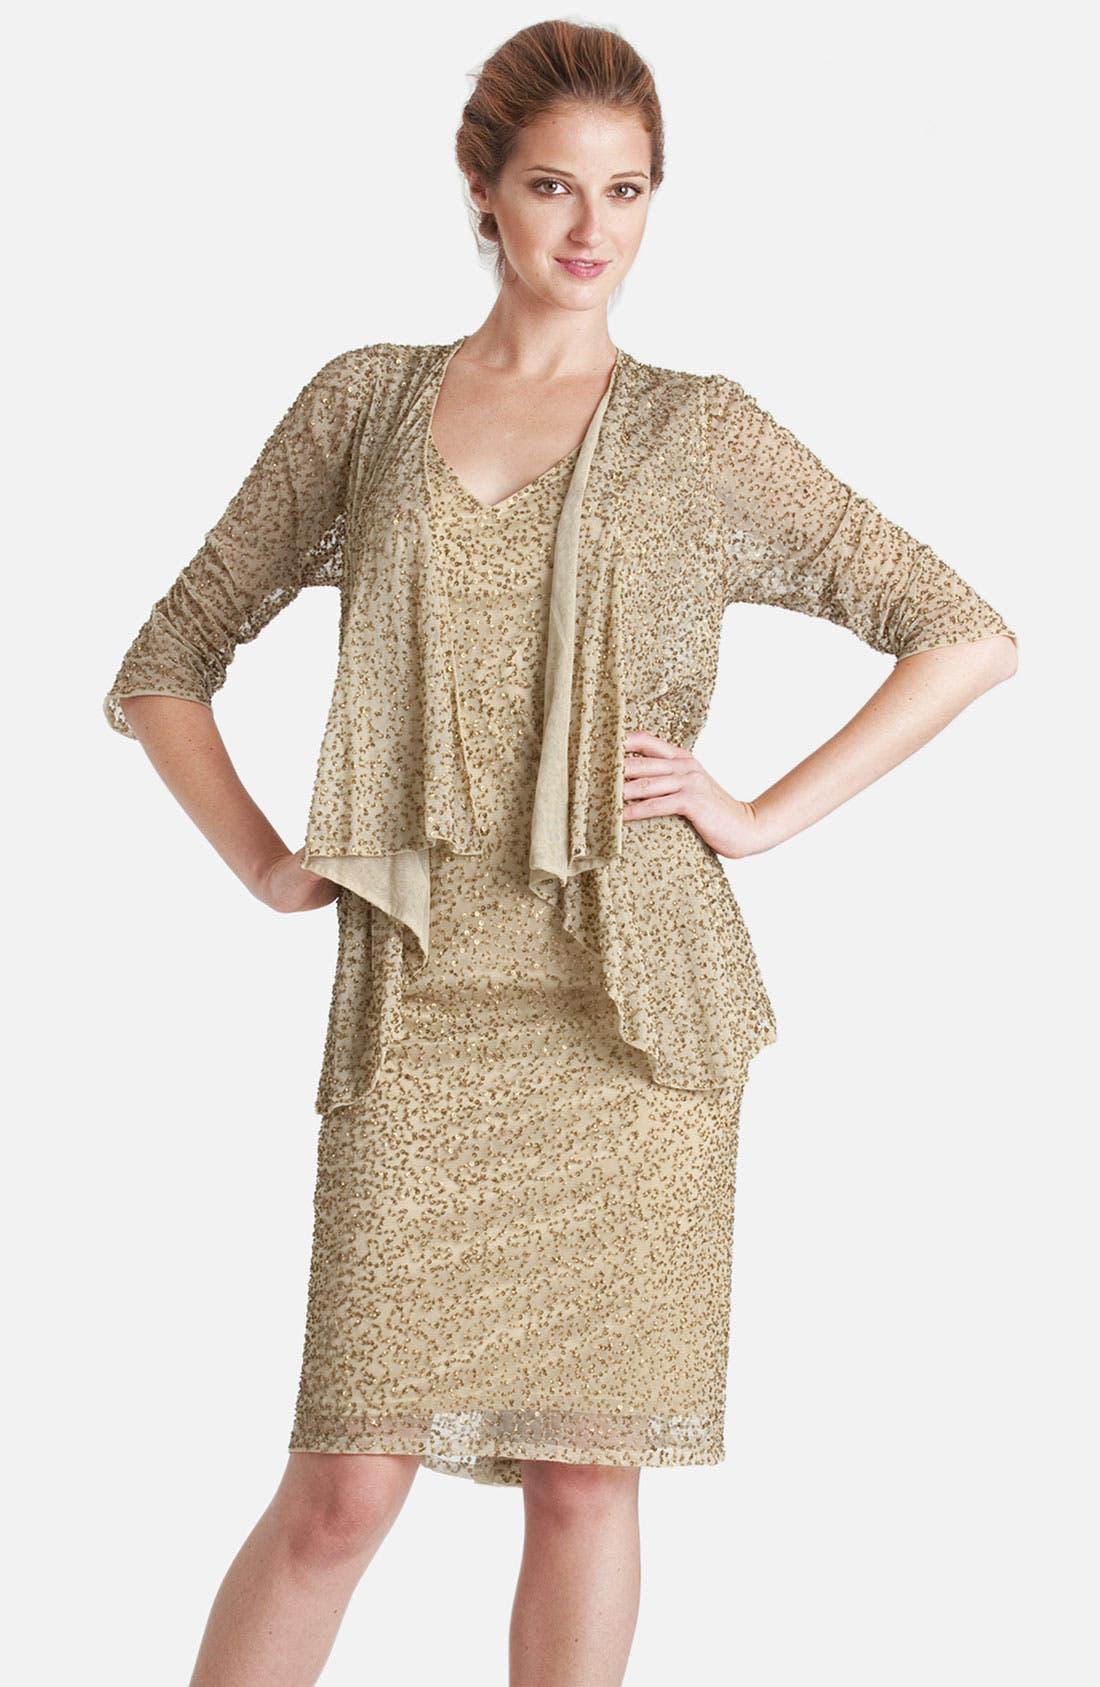 Main Image - JS Collections Embellished V-Neck Chiffon Dress & Jacket